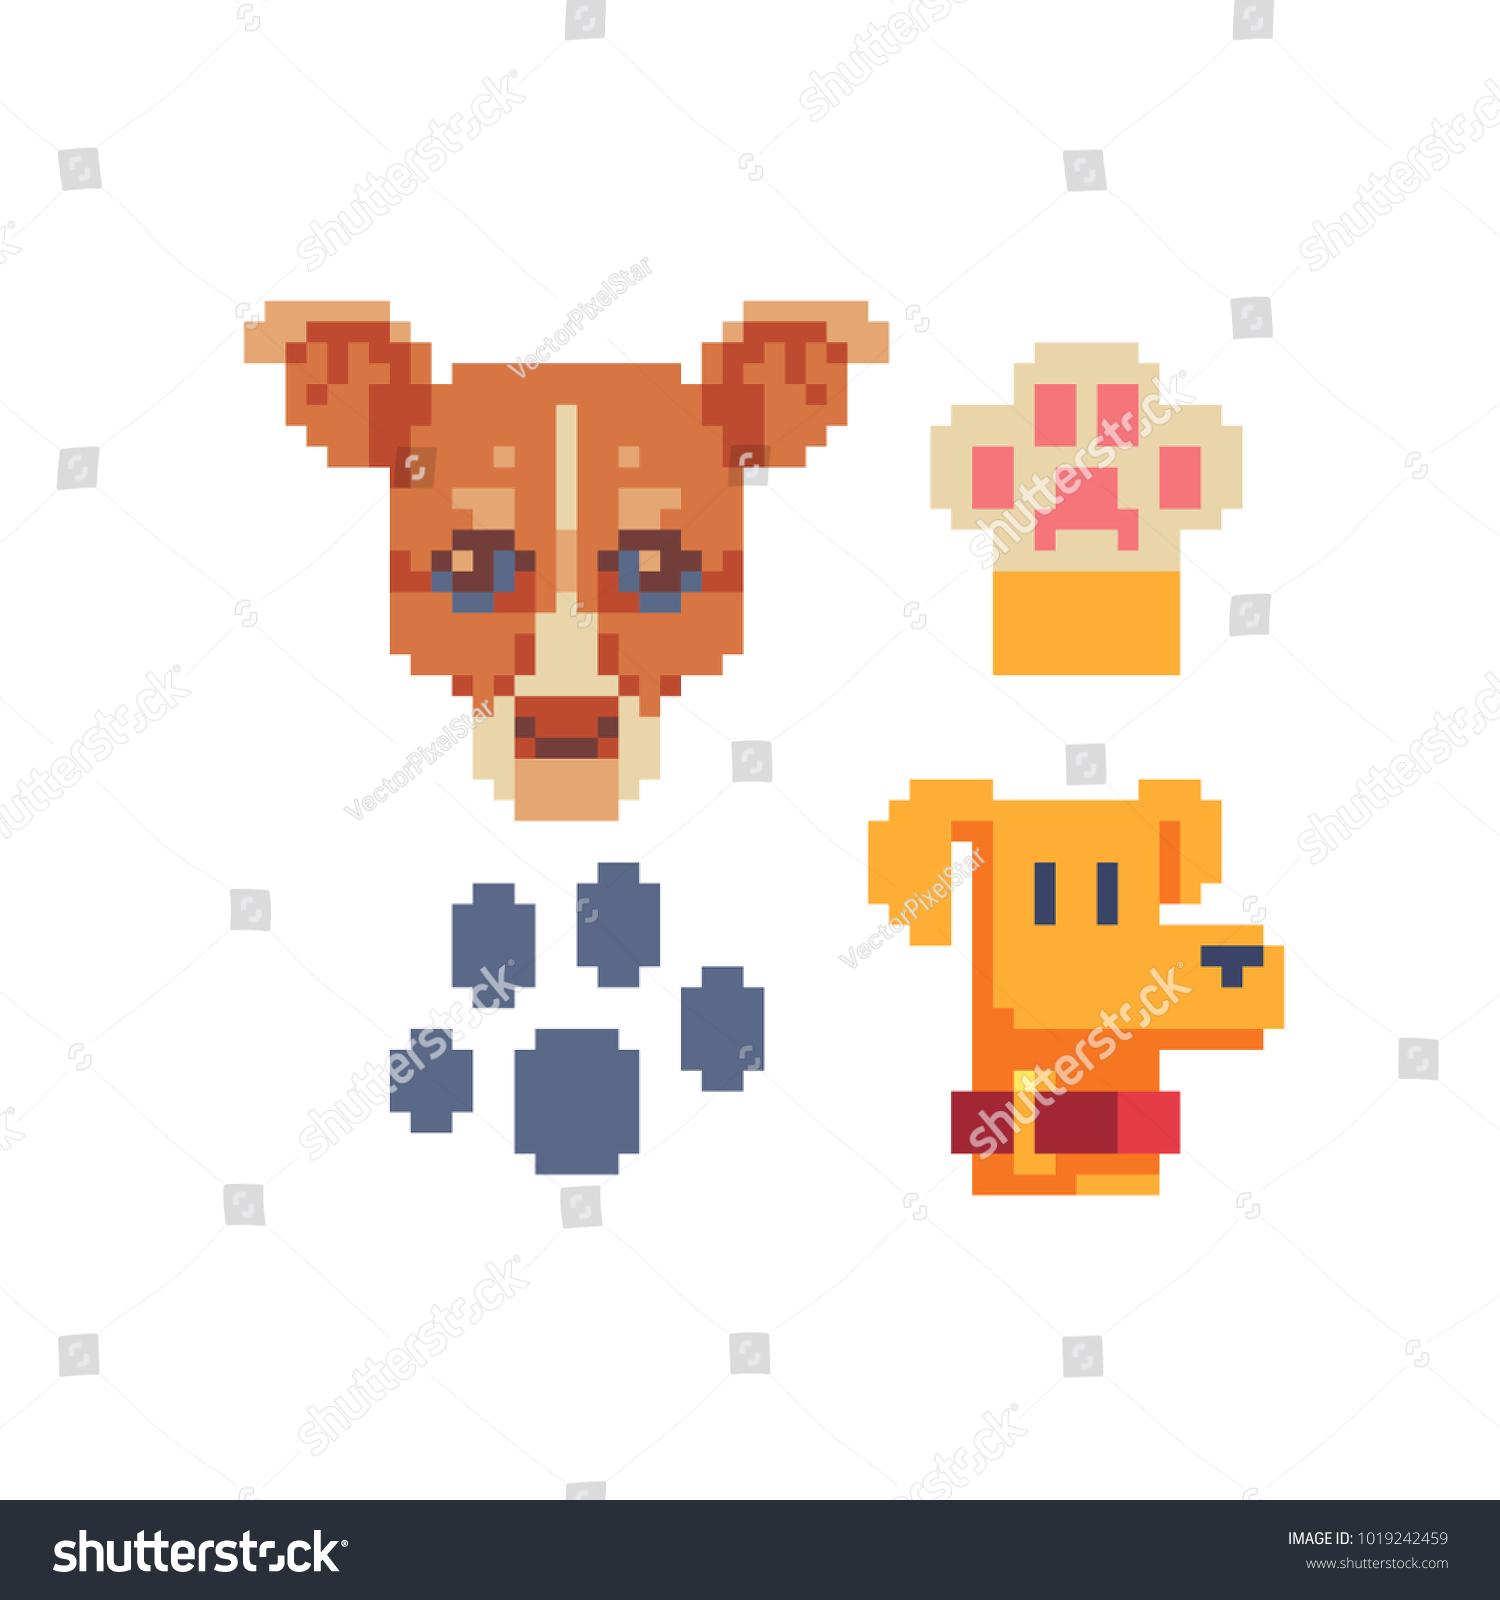 cute dogs paw footprint pixel art stock vector royalty free